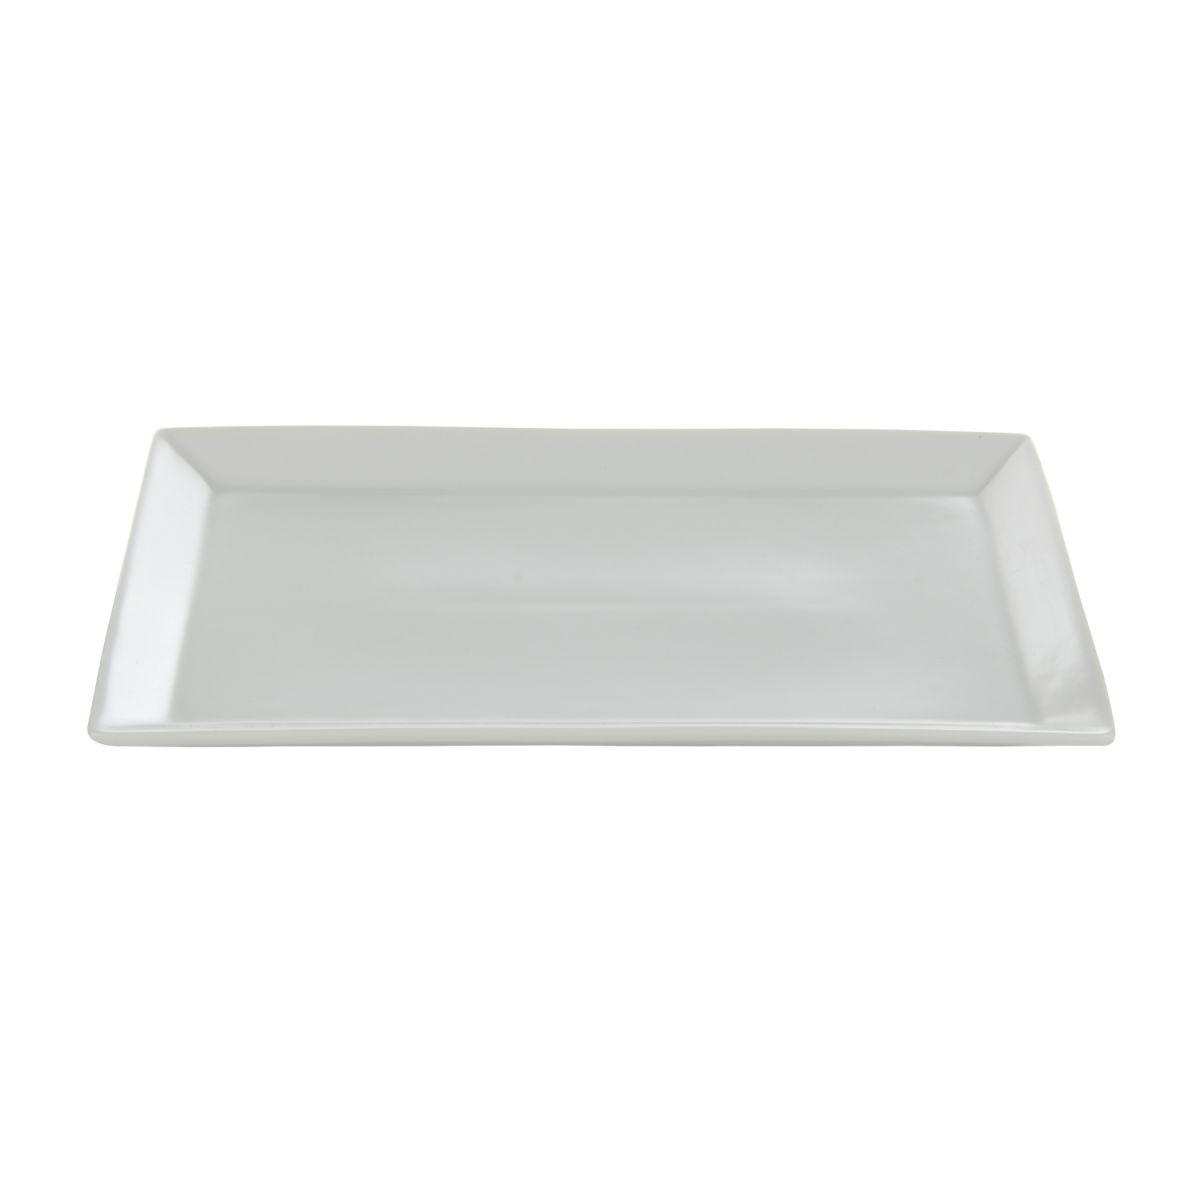 bord porselein rechthoekig wit 28x16x2cmbox 6